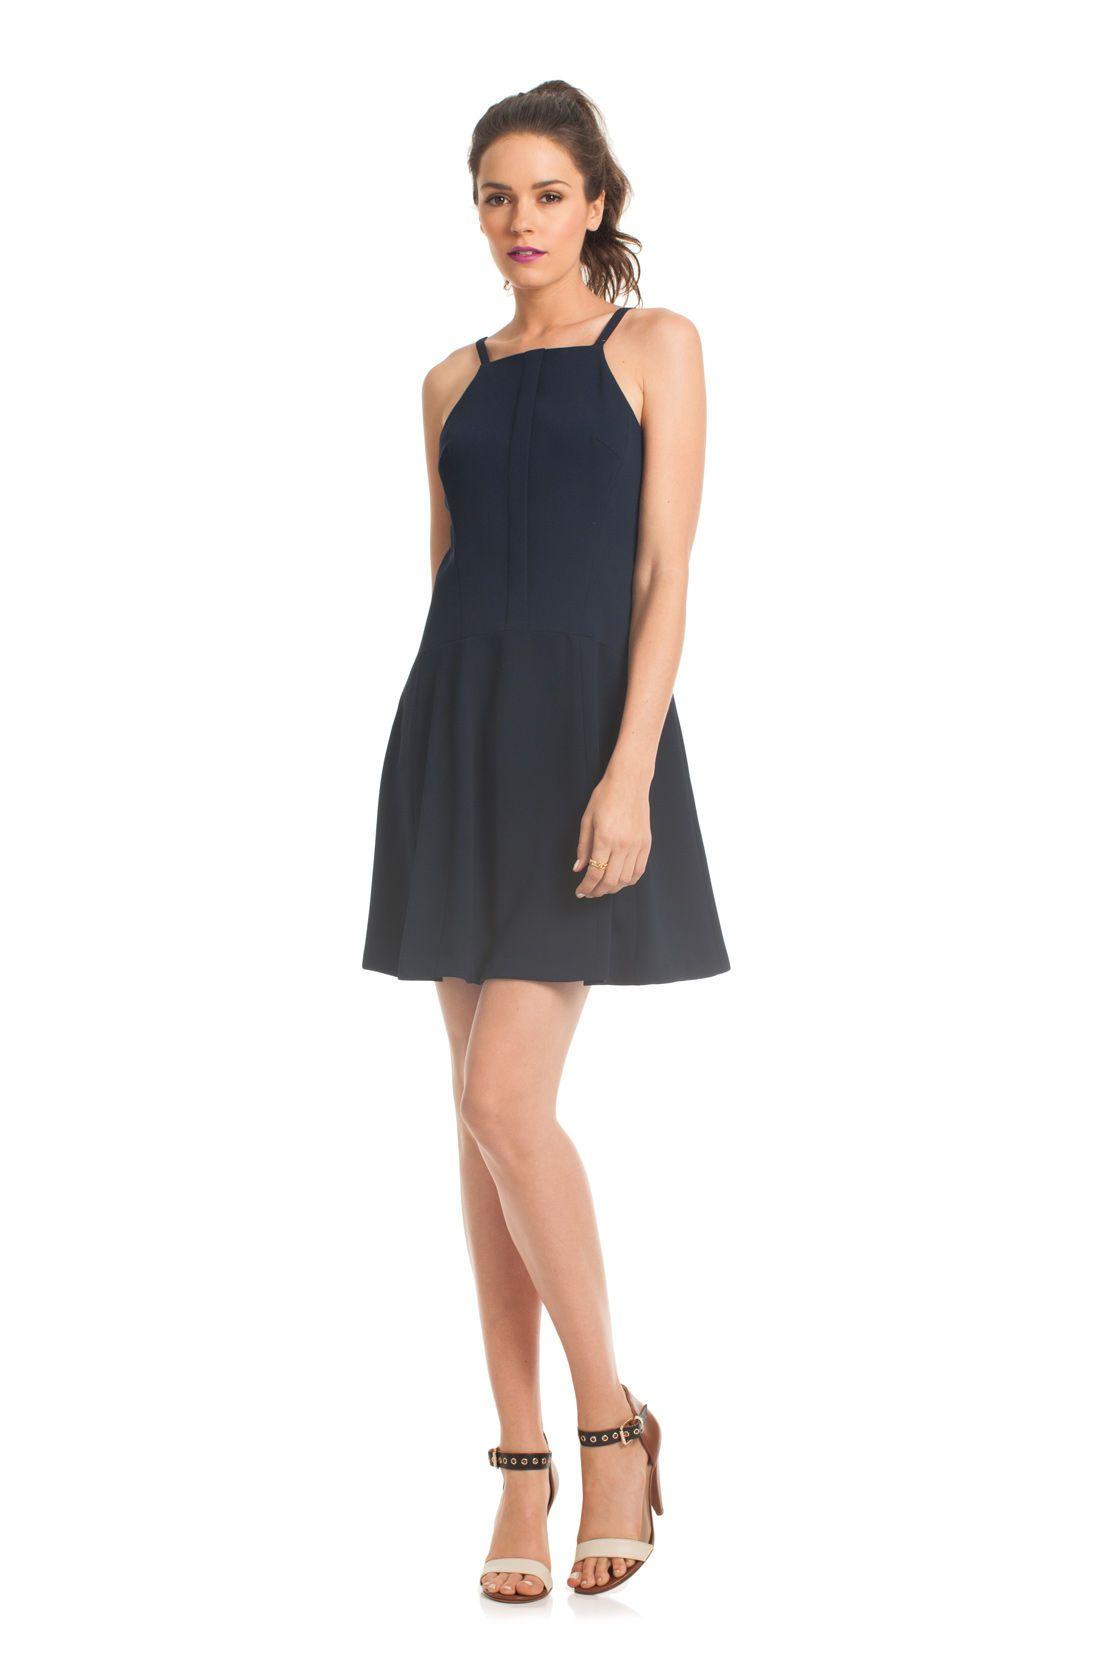 Renee dress trinaturk why are such elegant simple dresses